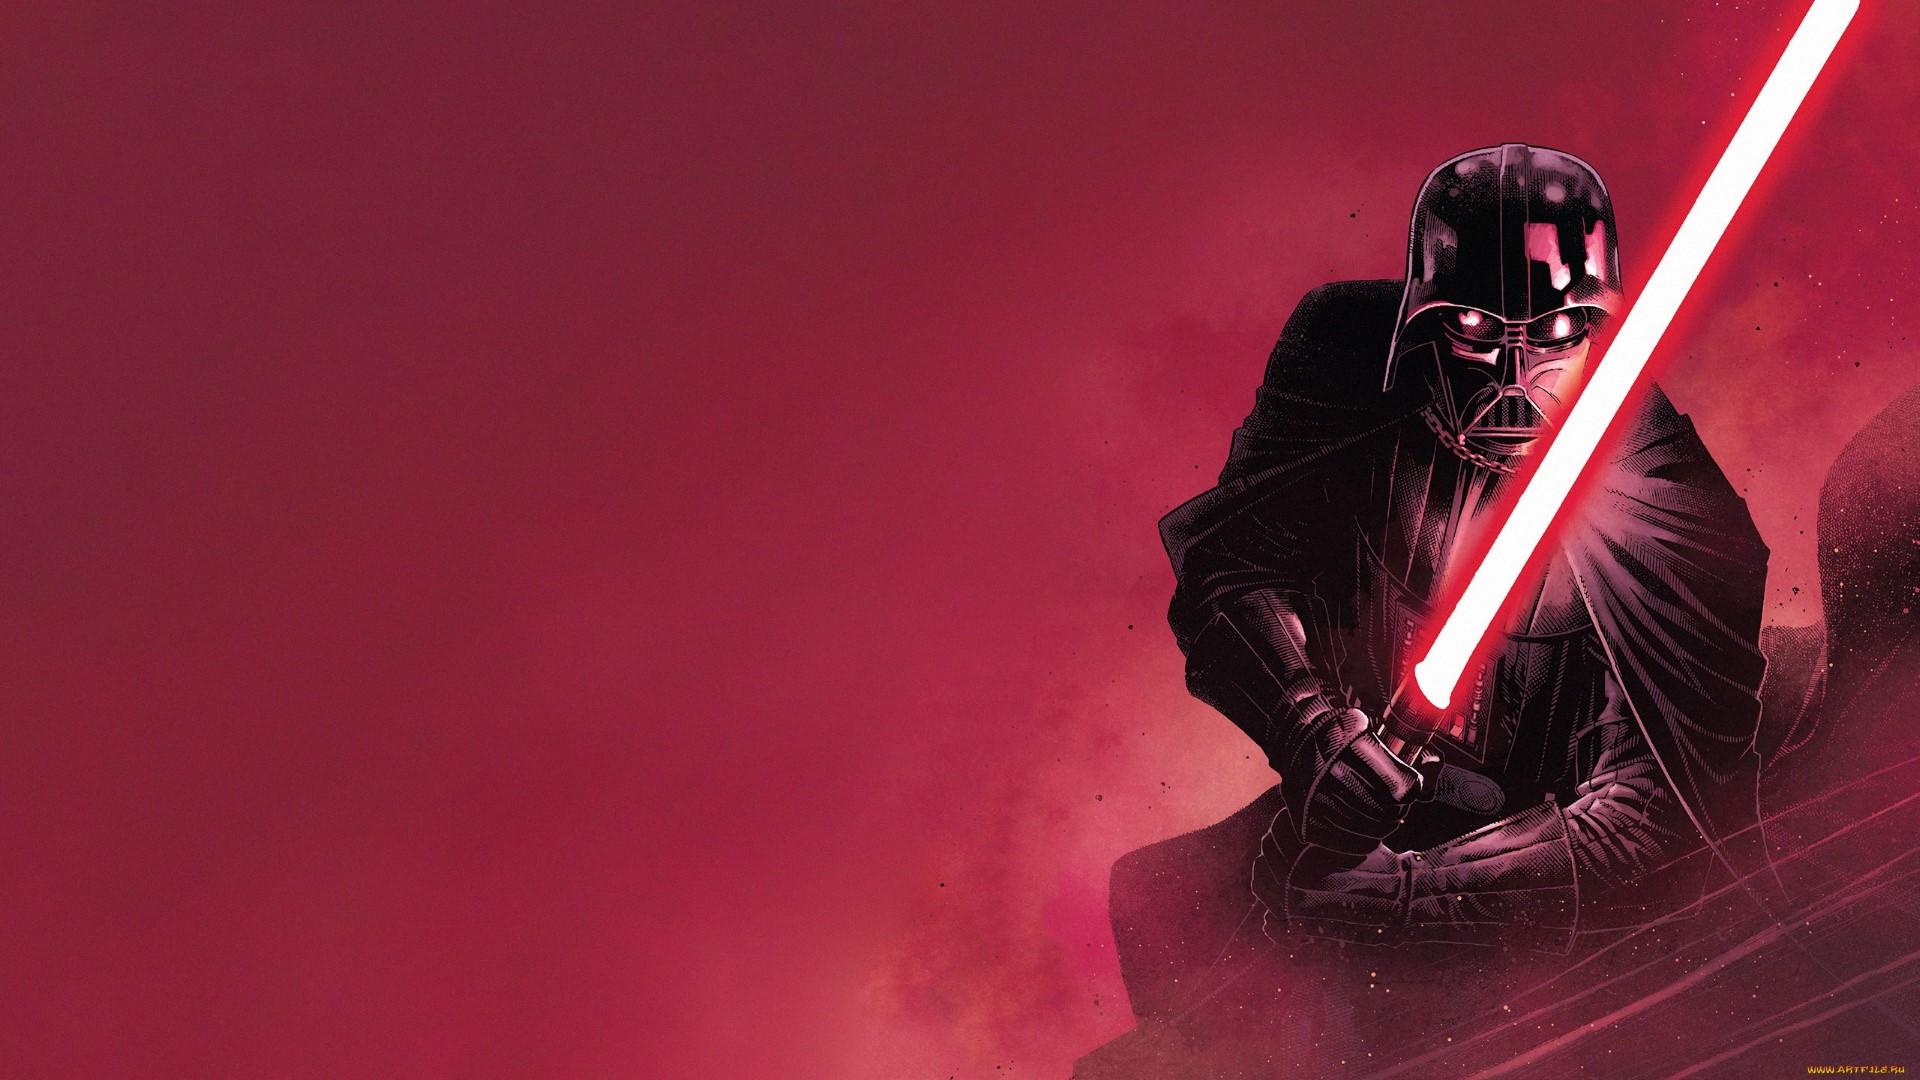 Wallpaper Star Wars Villains Darth Vader Sith Lightsaber Science Fiction 1920x1080 Wallpapermaniac 1560727 Hd Wallpapers Wallhere